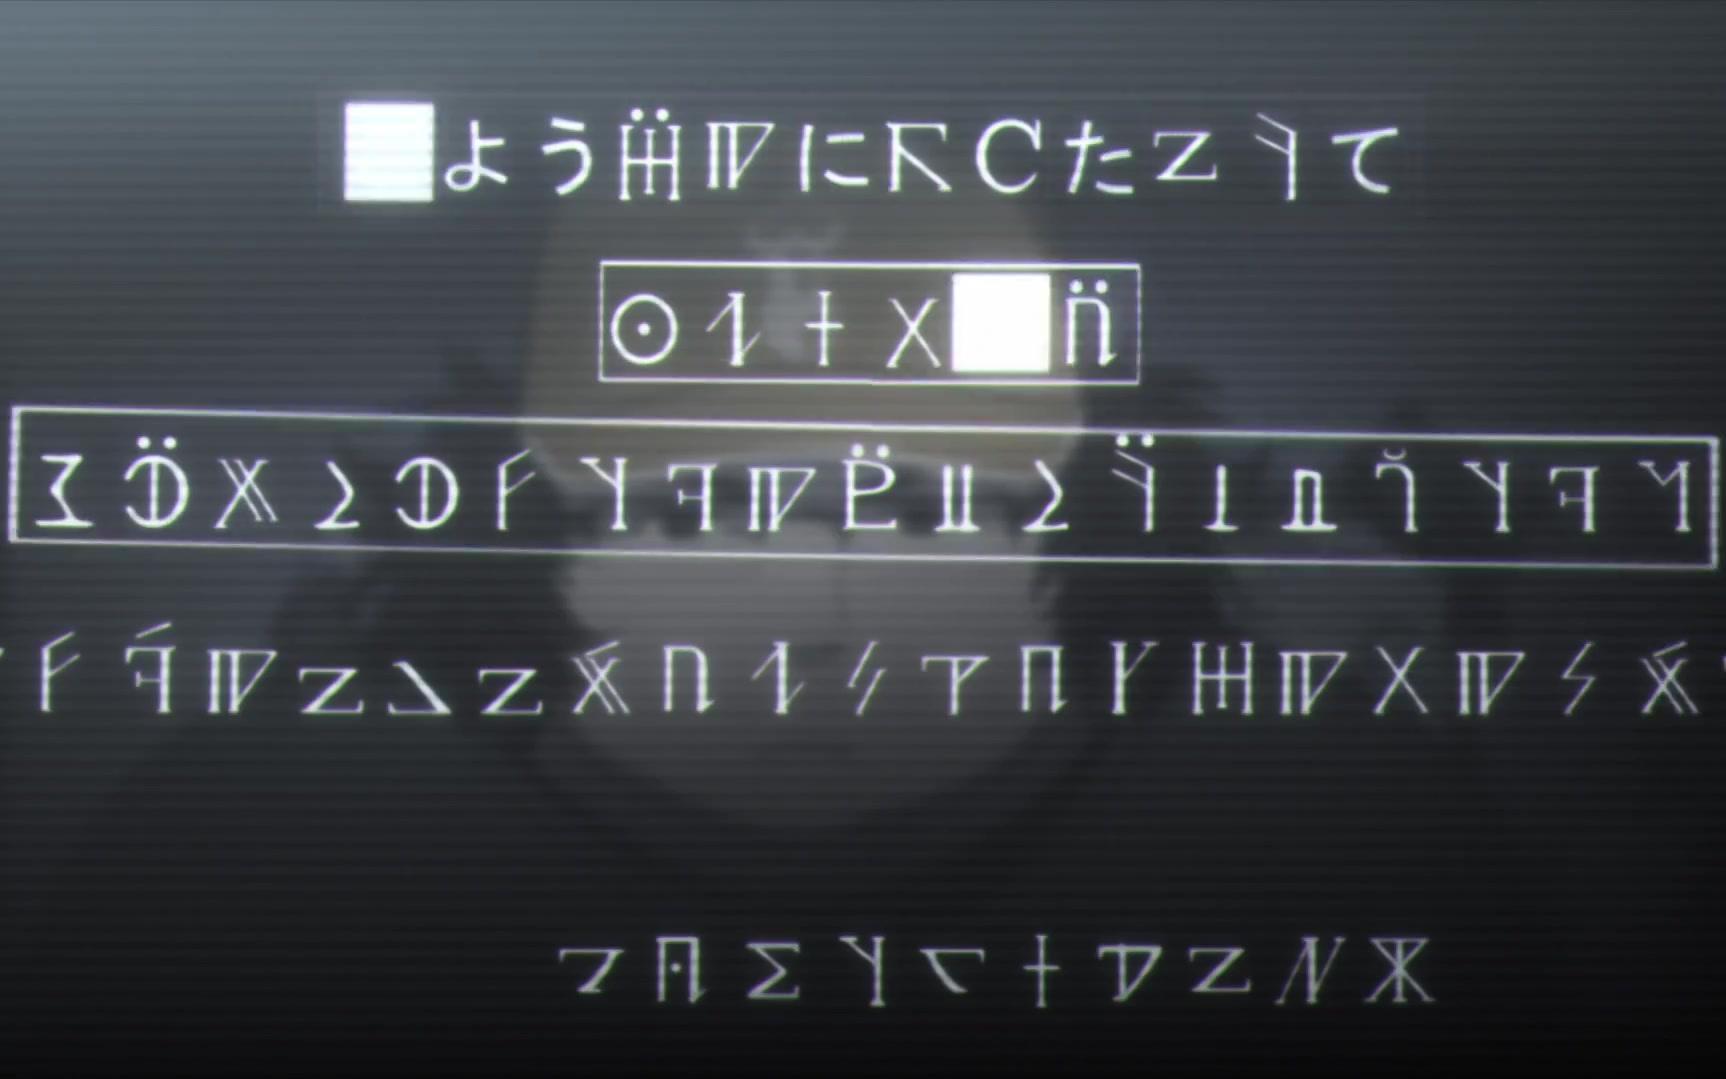 『STEINS;GATE ELITE』×『LOST SONG』联动CM